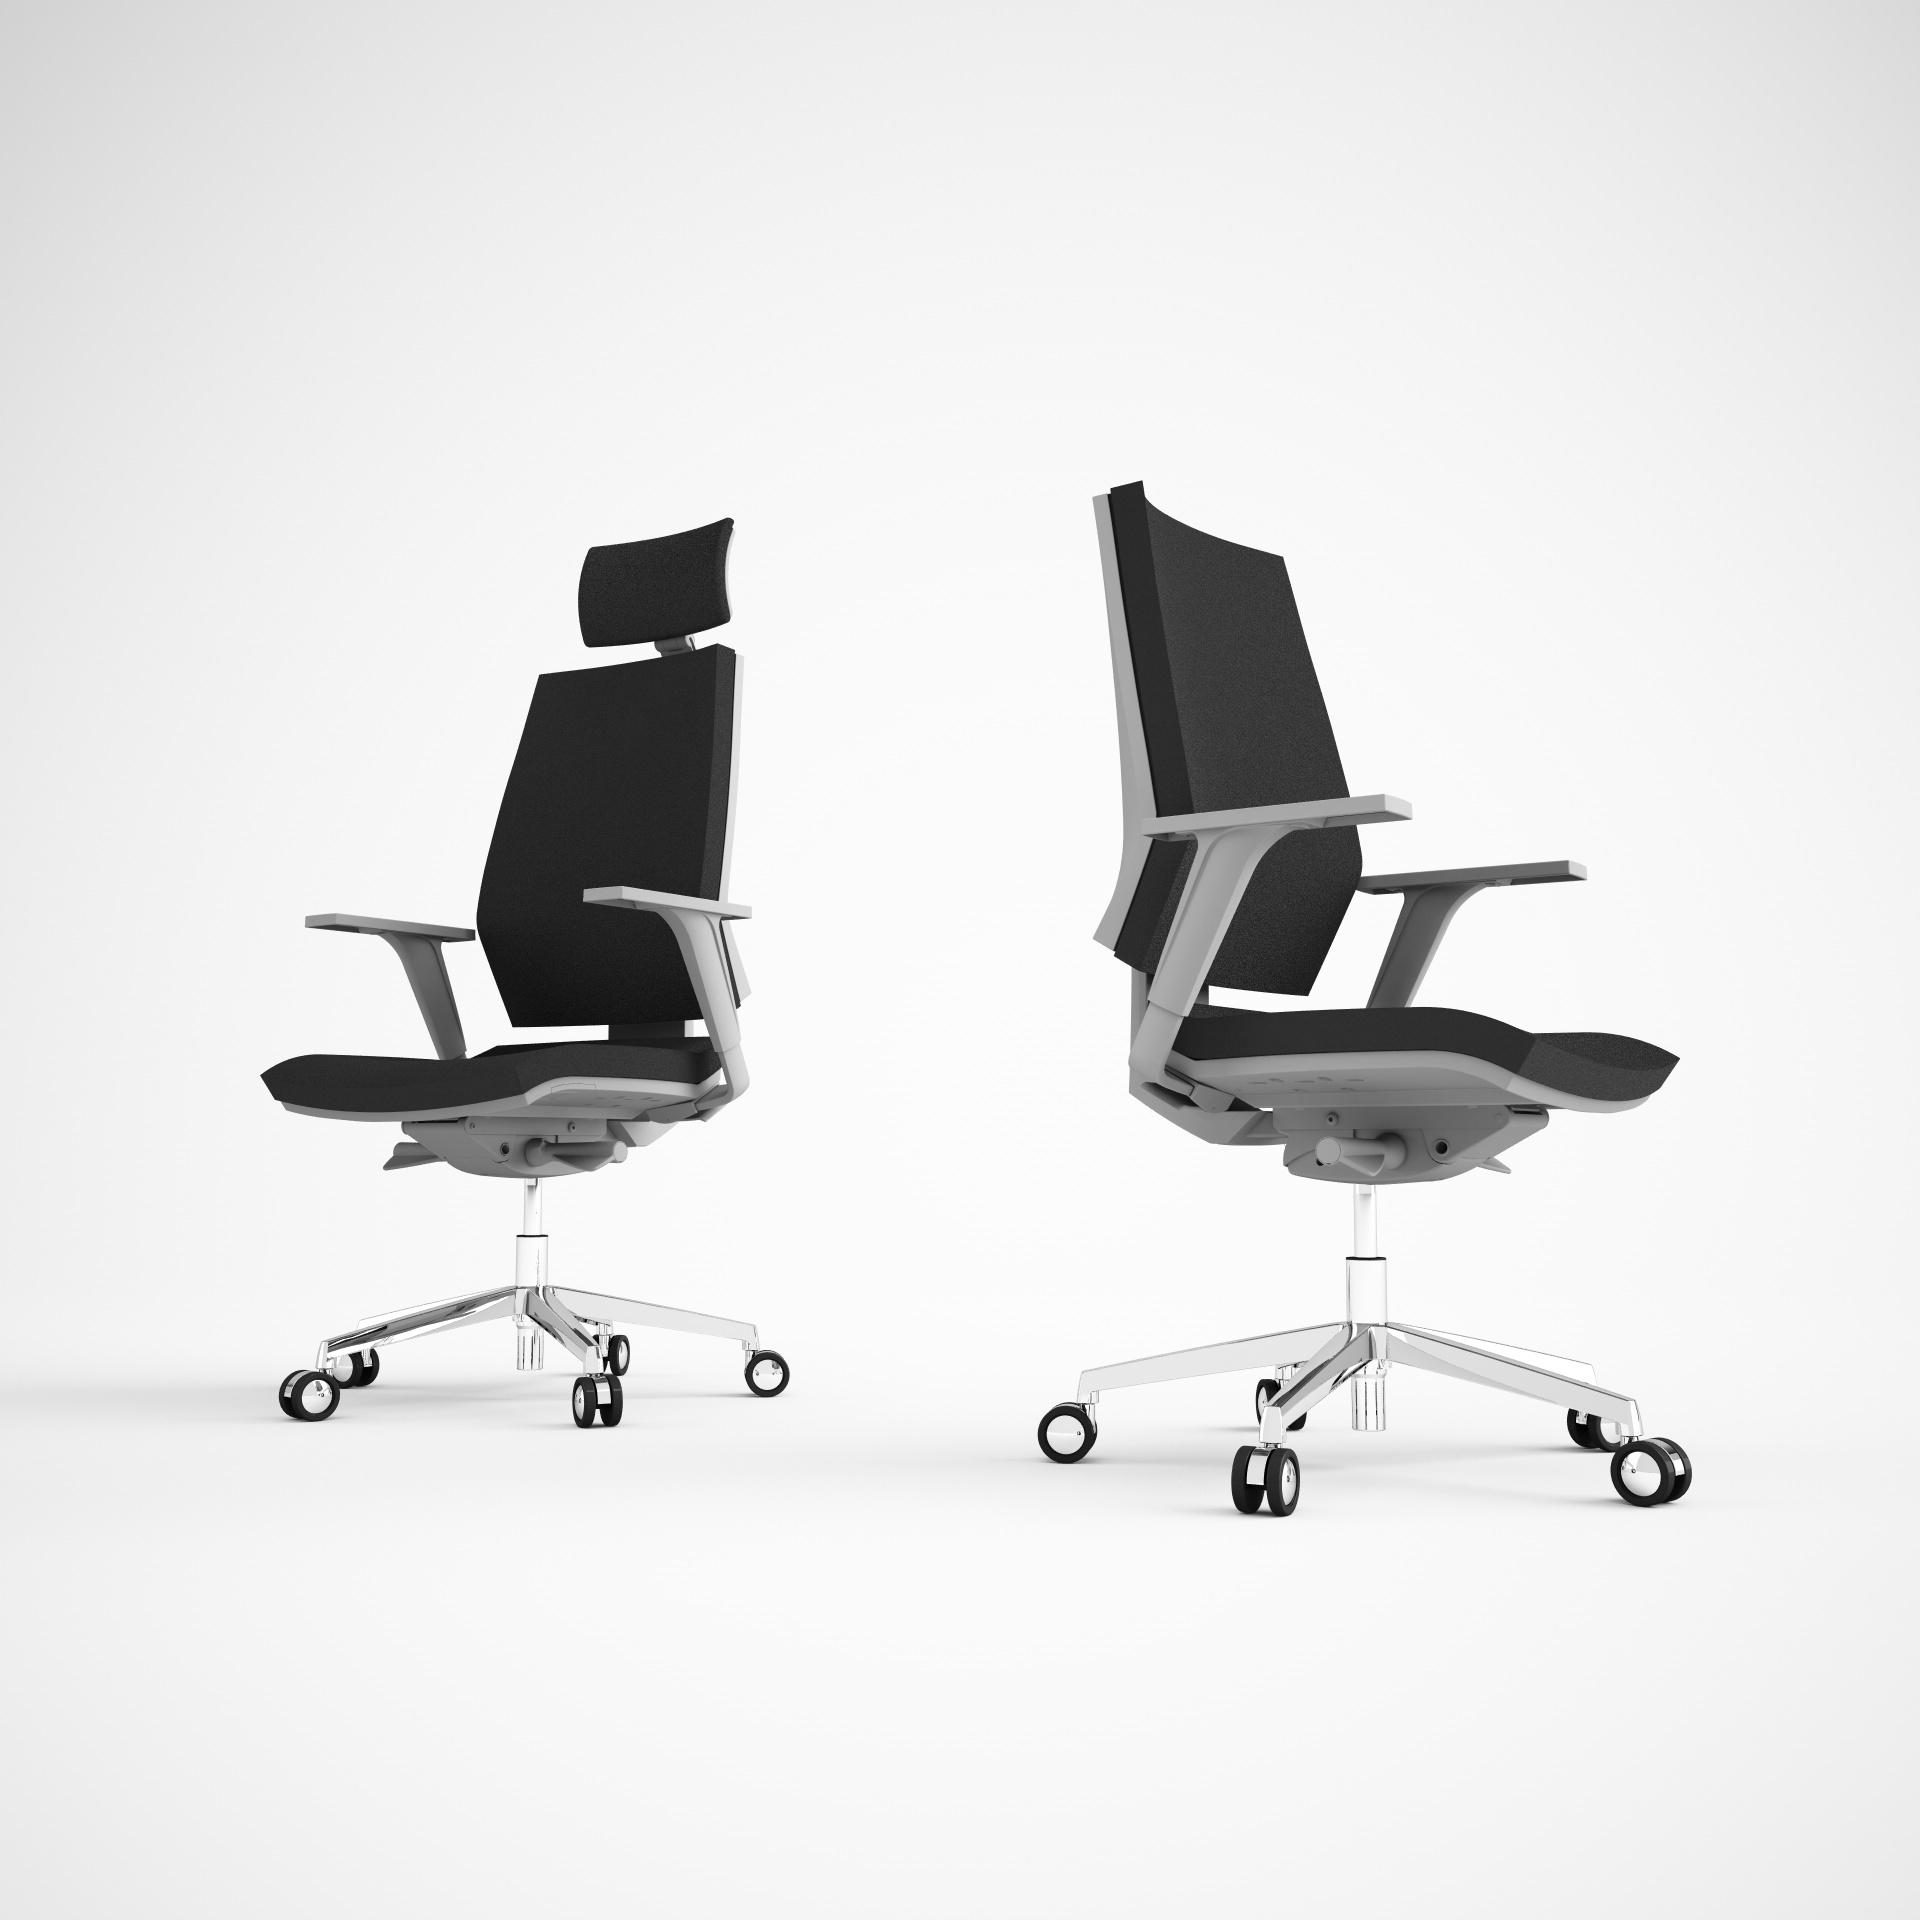 Sedia regolabile in altezza ed inclinabile